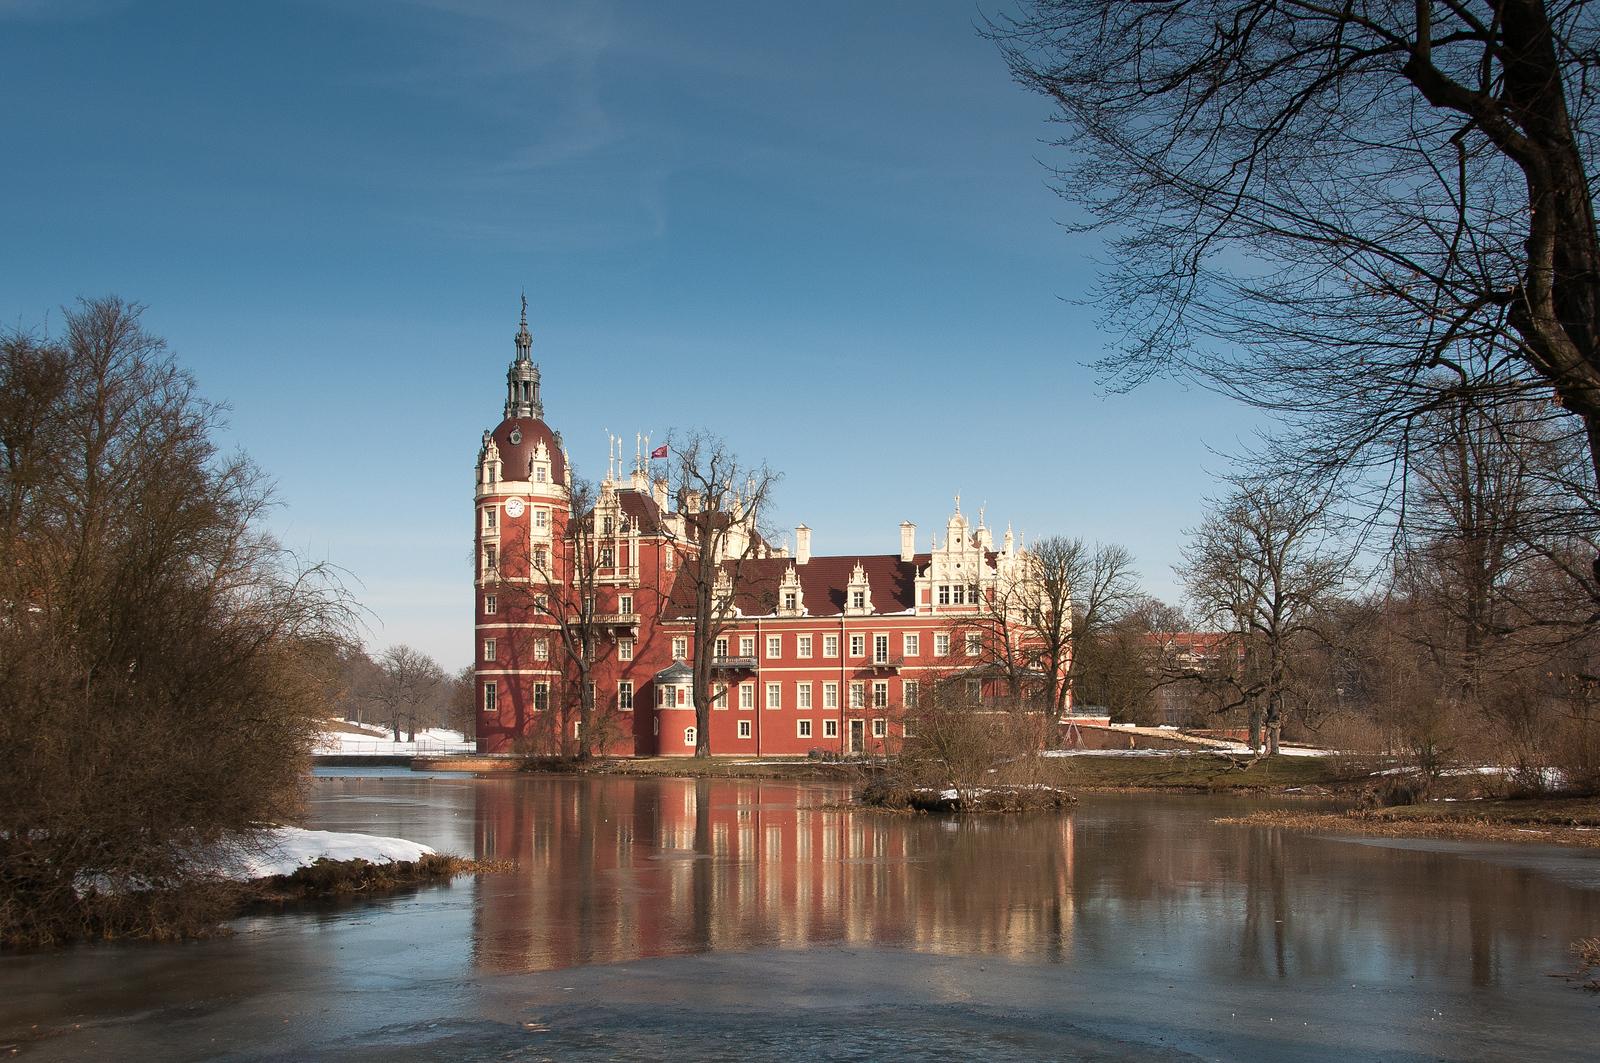 Muskauer Park / Park Muzakowski UNESCO World Heritage Site